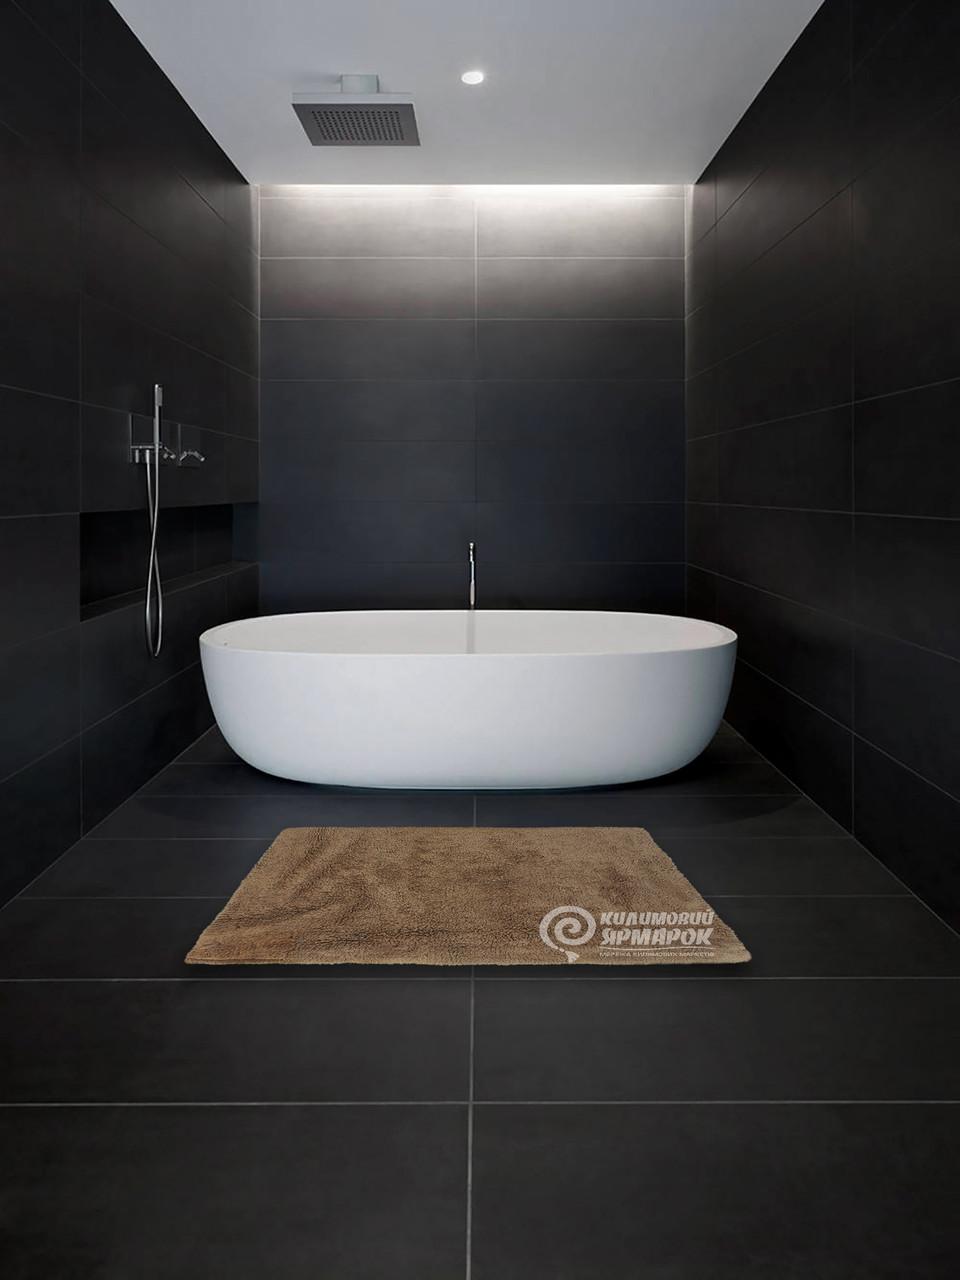 Коврик для ванной комнаты 16286A BATH MAT 1,5Х1,5 БЕЖЕВЫЙ квадрат